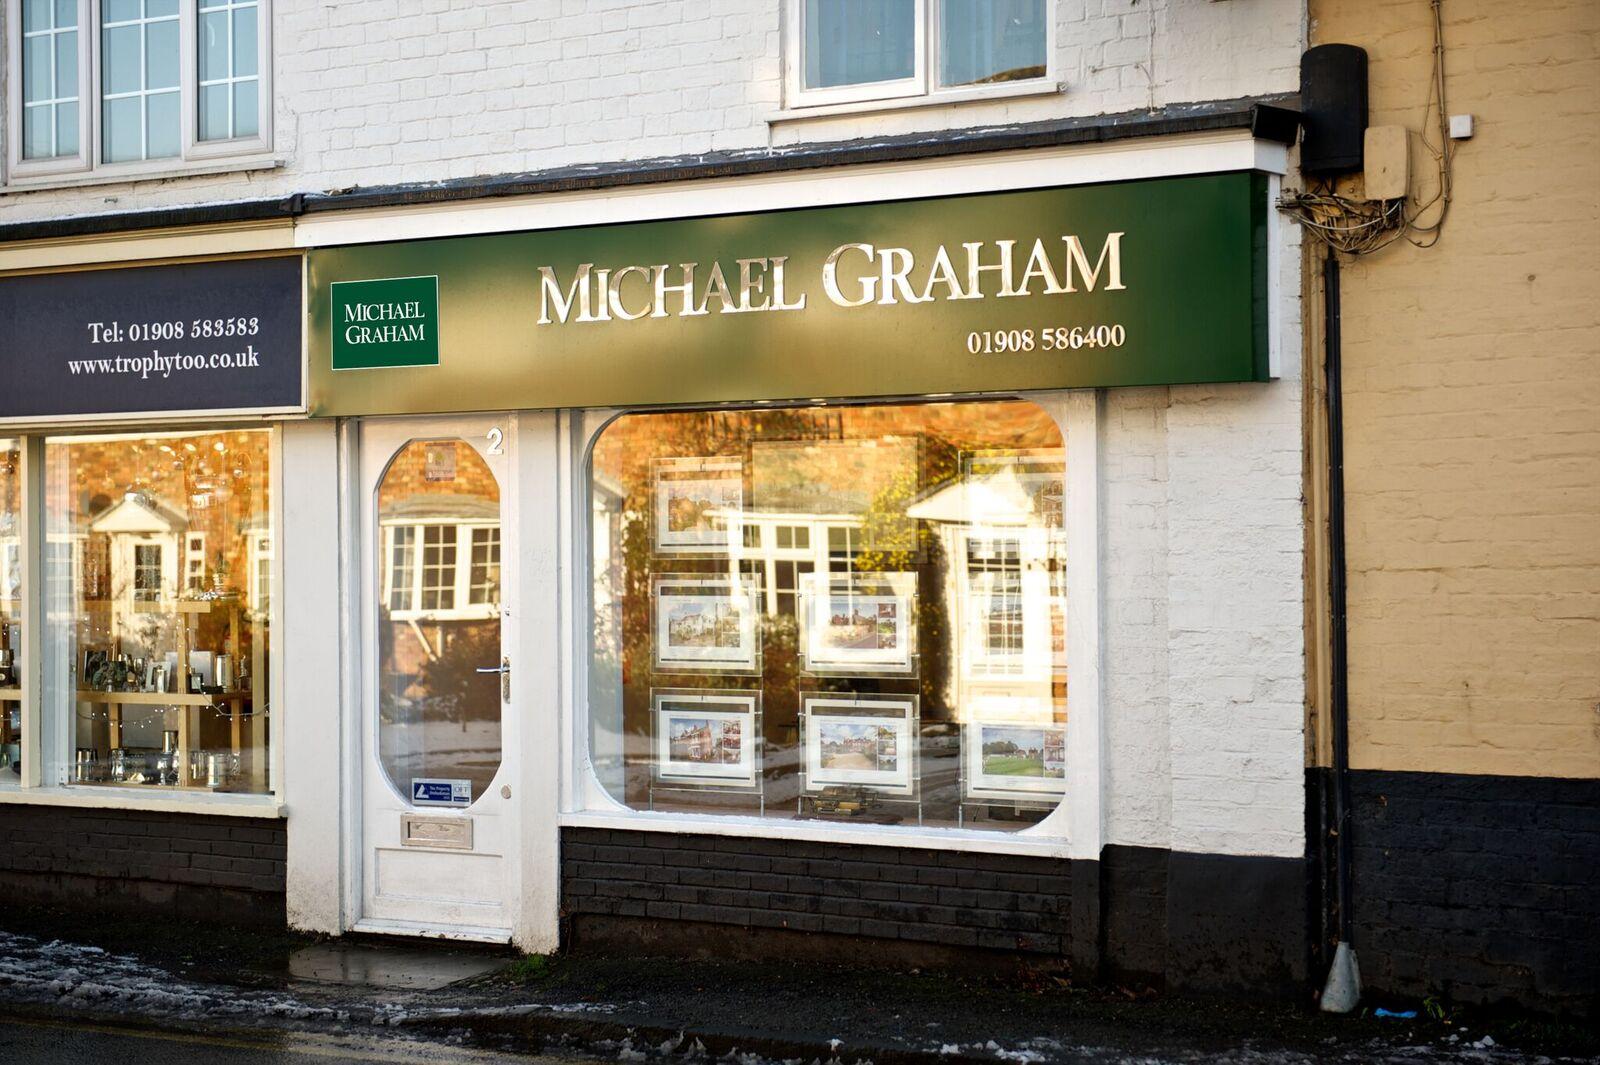 Michael Graham Woburn Sands - Milton Keynes, Bedfordshire MK17 8NJ - 01908 586400 | ShowMeLocal.com